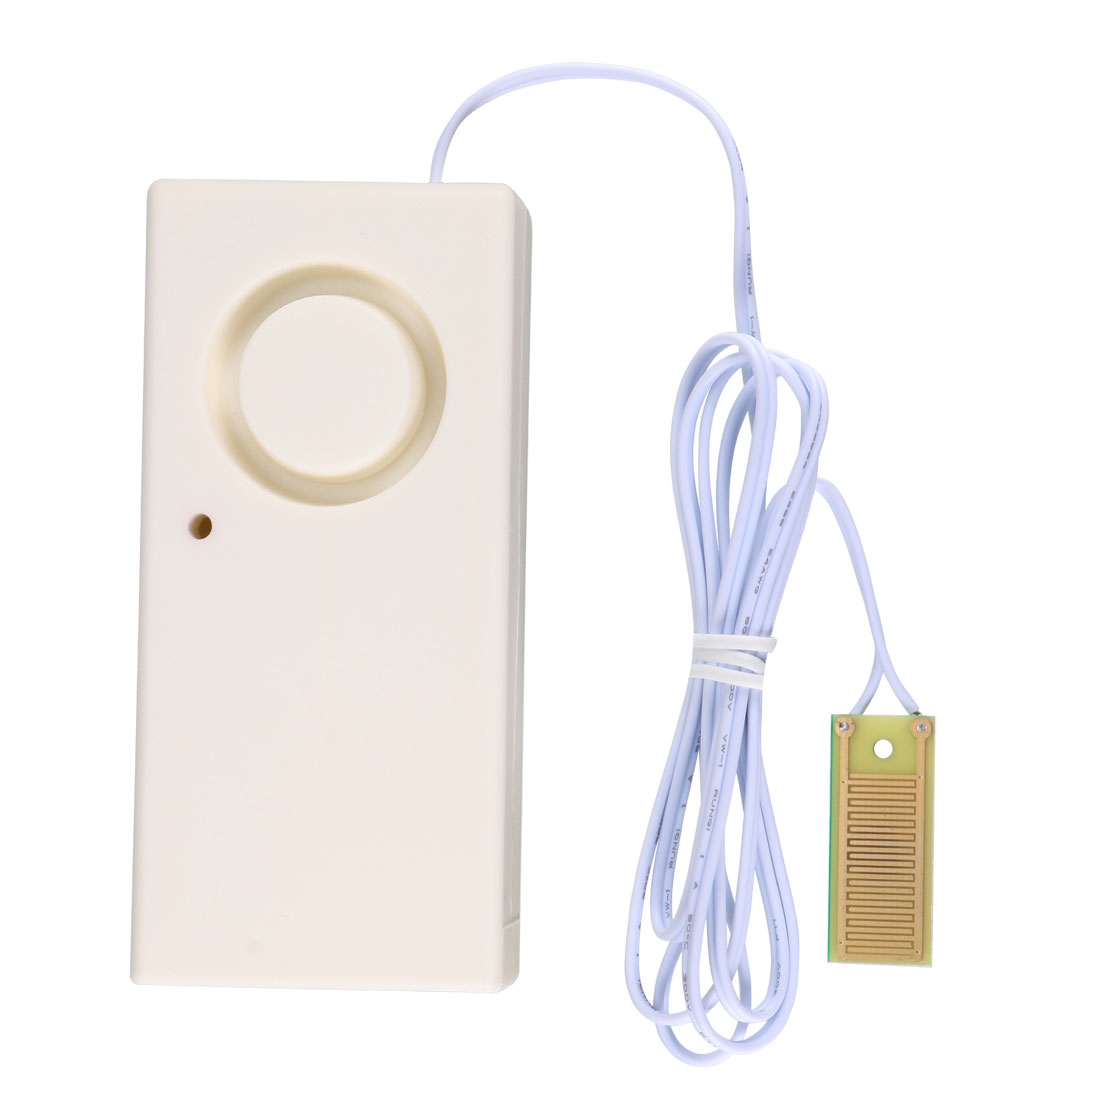 Home Water Leak Sensor Alarm Detector Water Overflow Alarm for Leak Detection